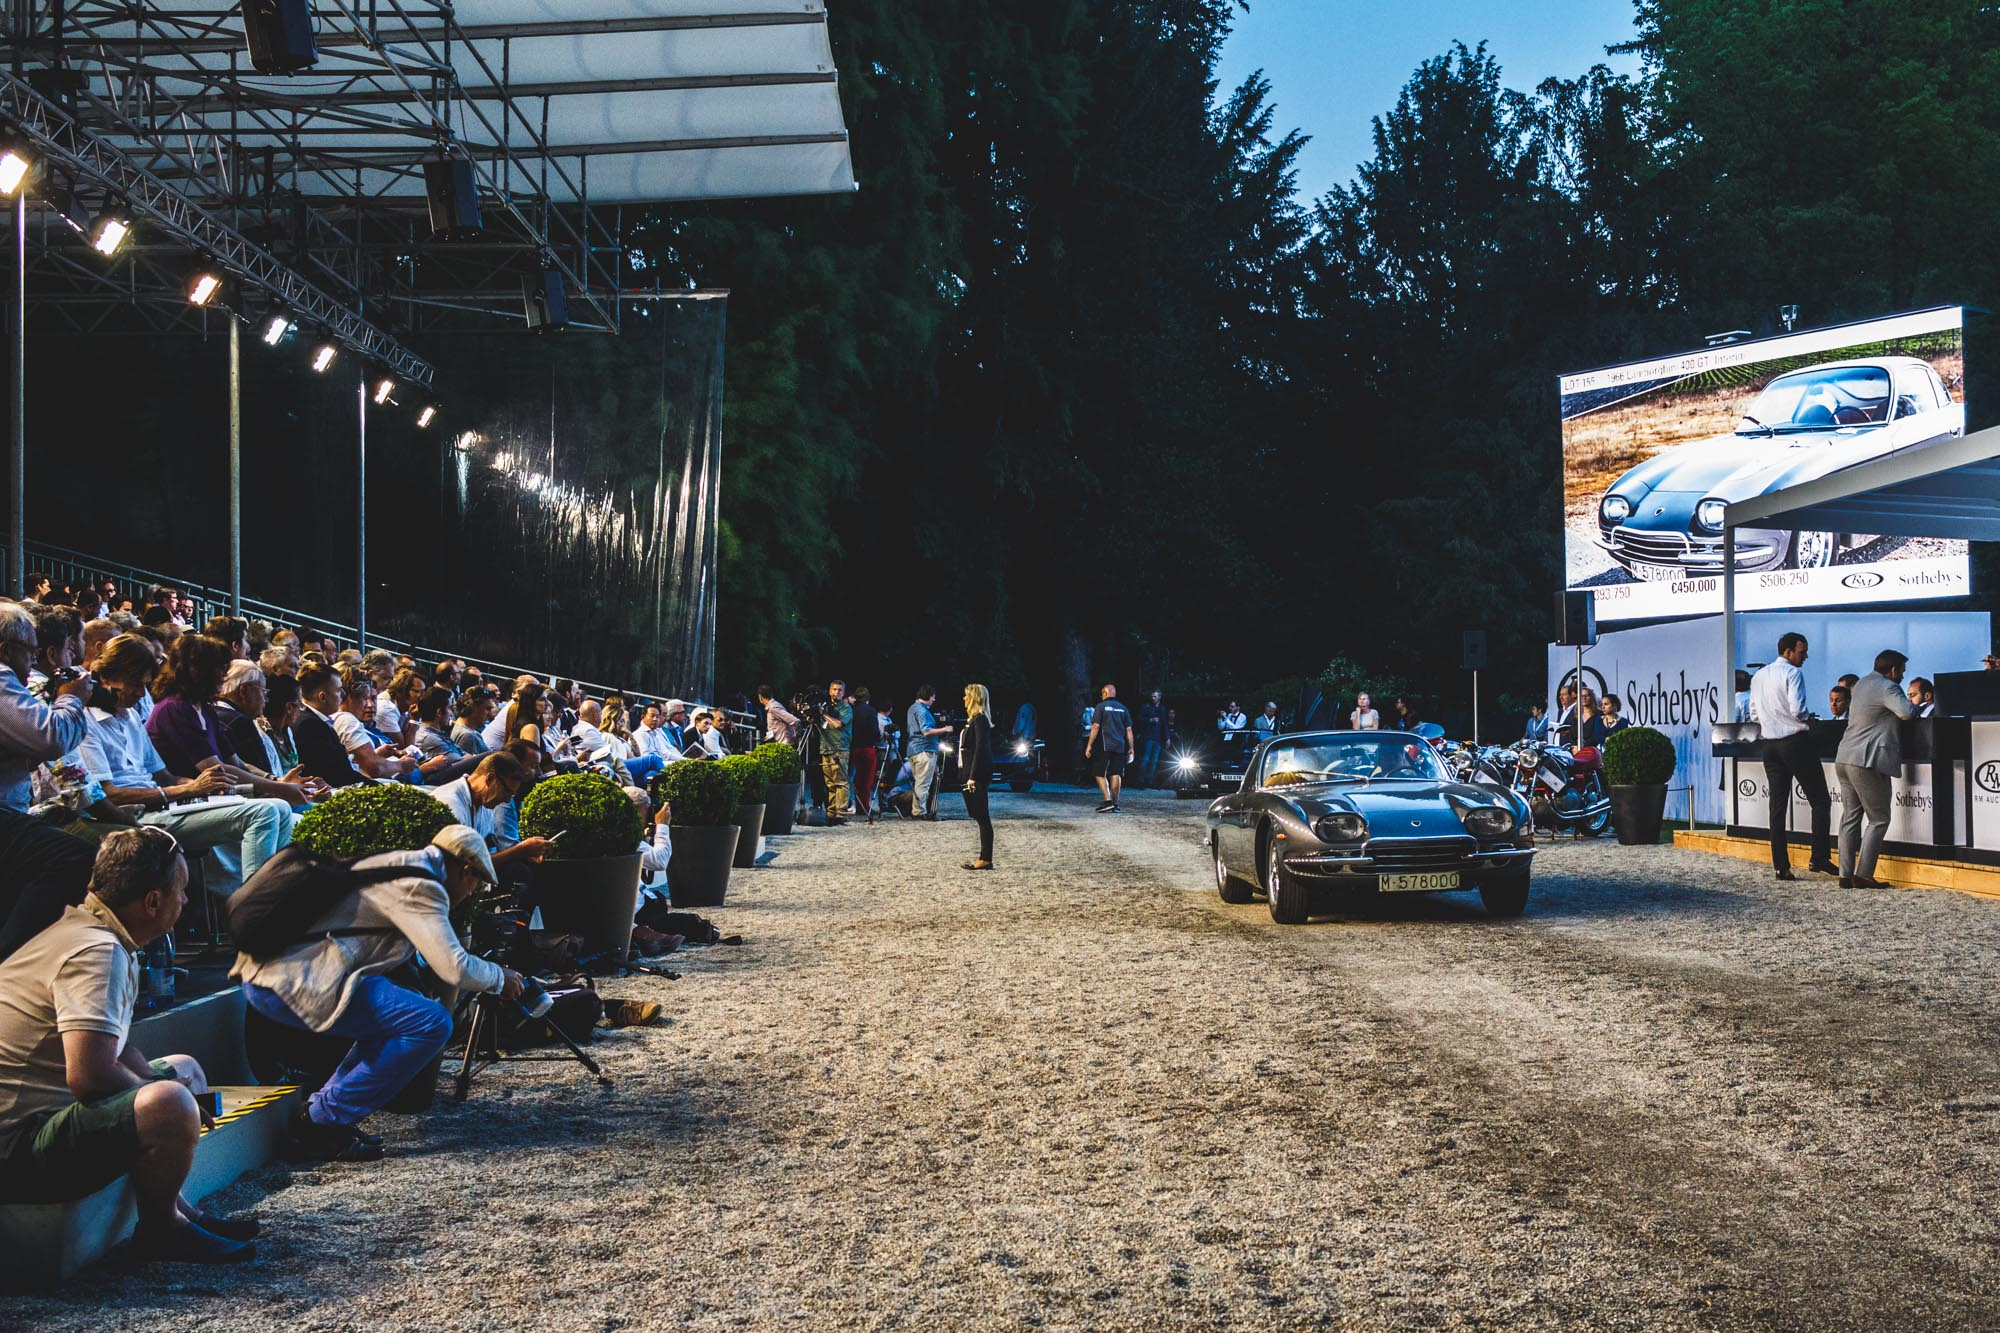 Lamborghini 400 GT Interim, estimée entre 650 000 et 750 000 euros, invendue.